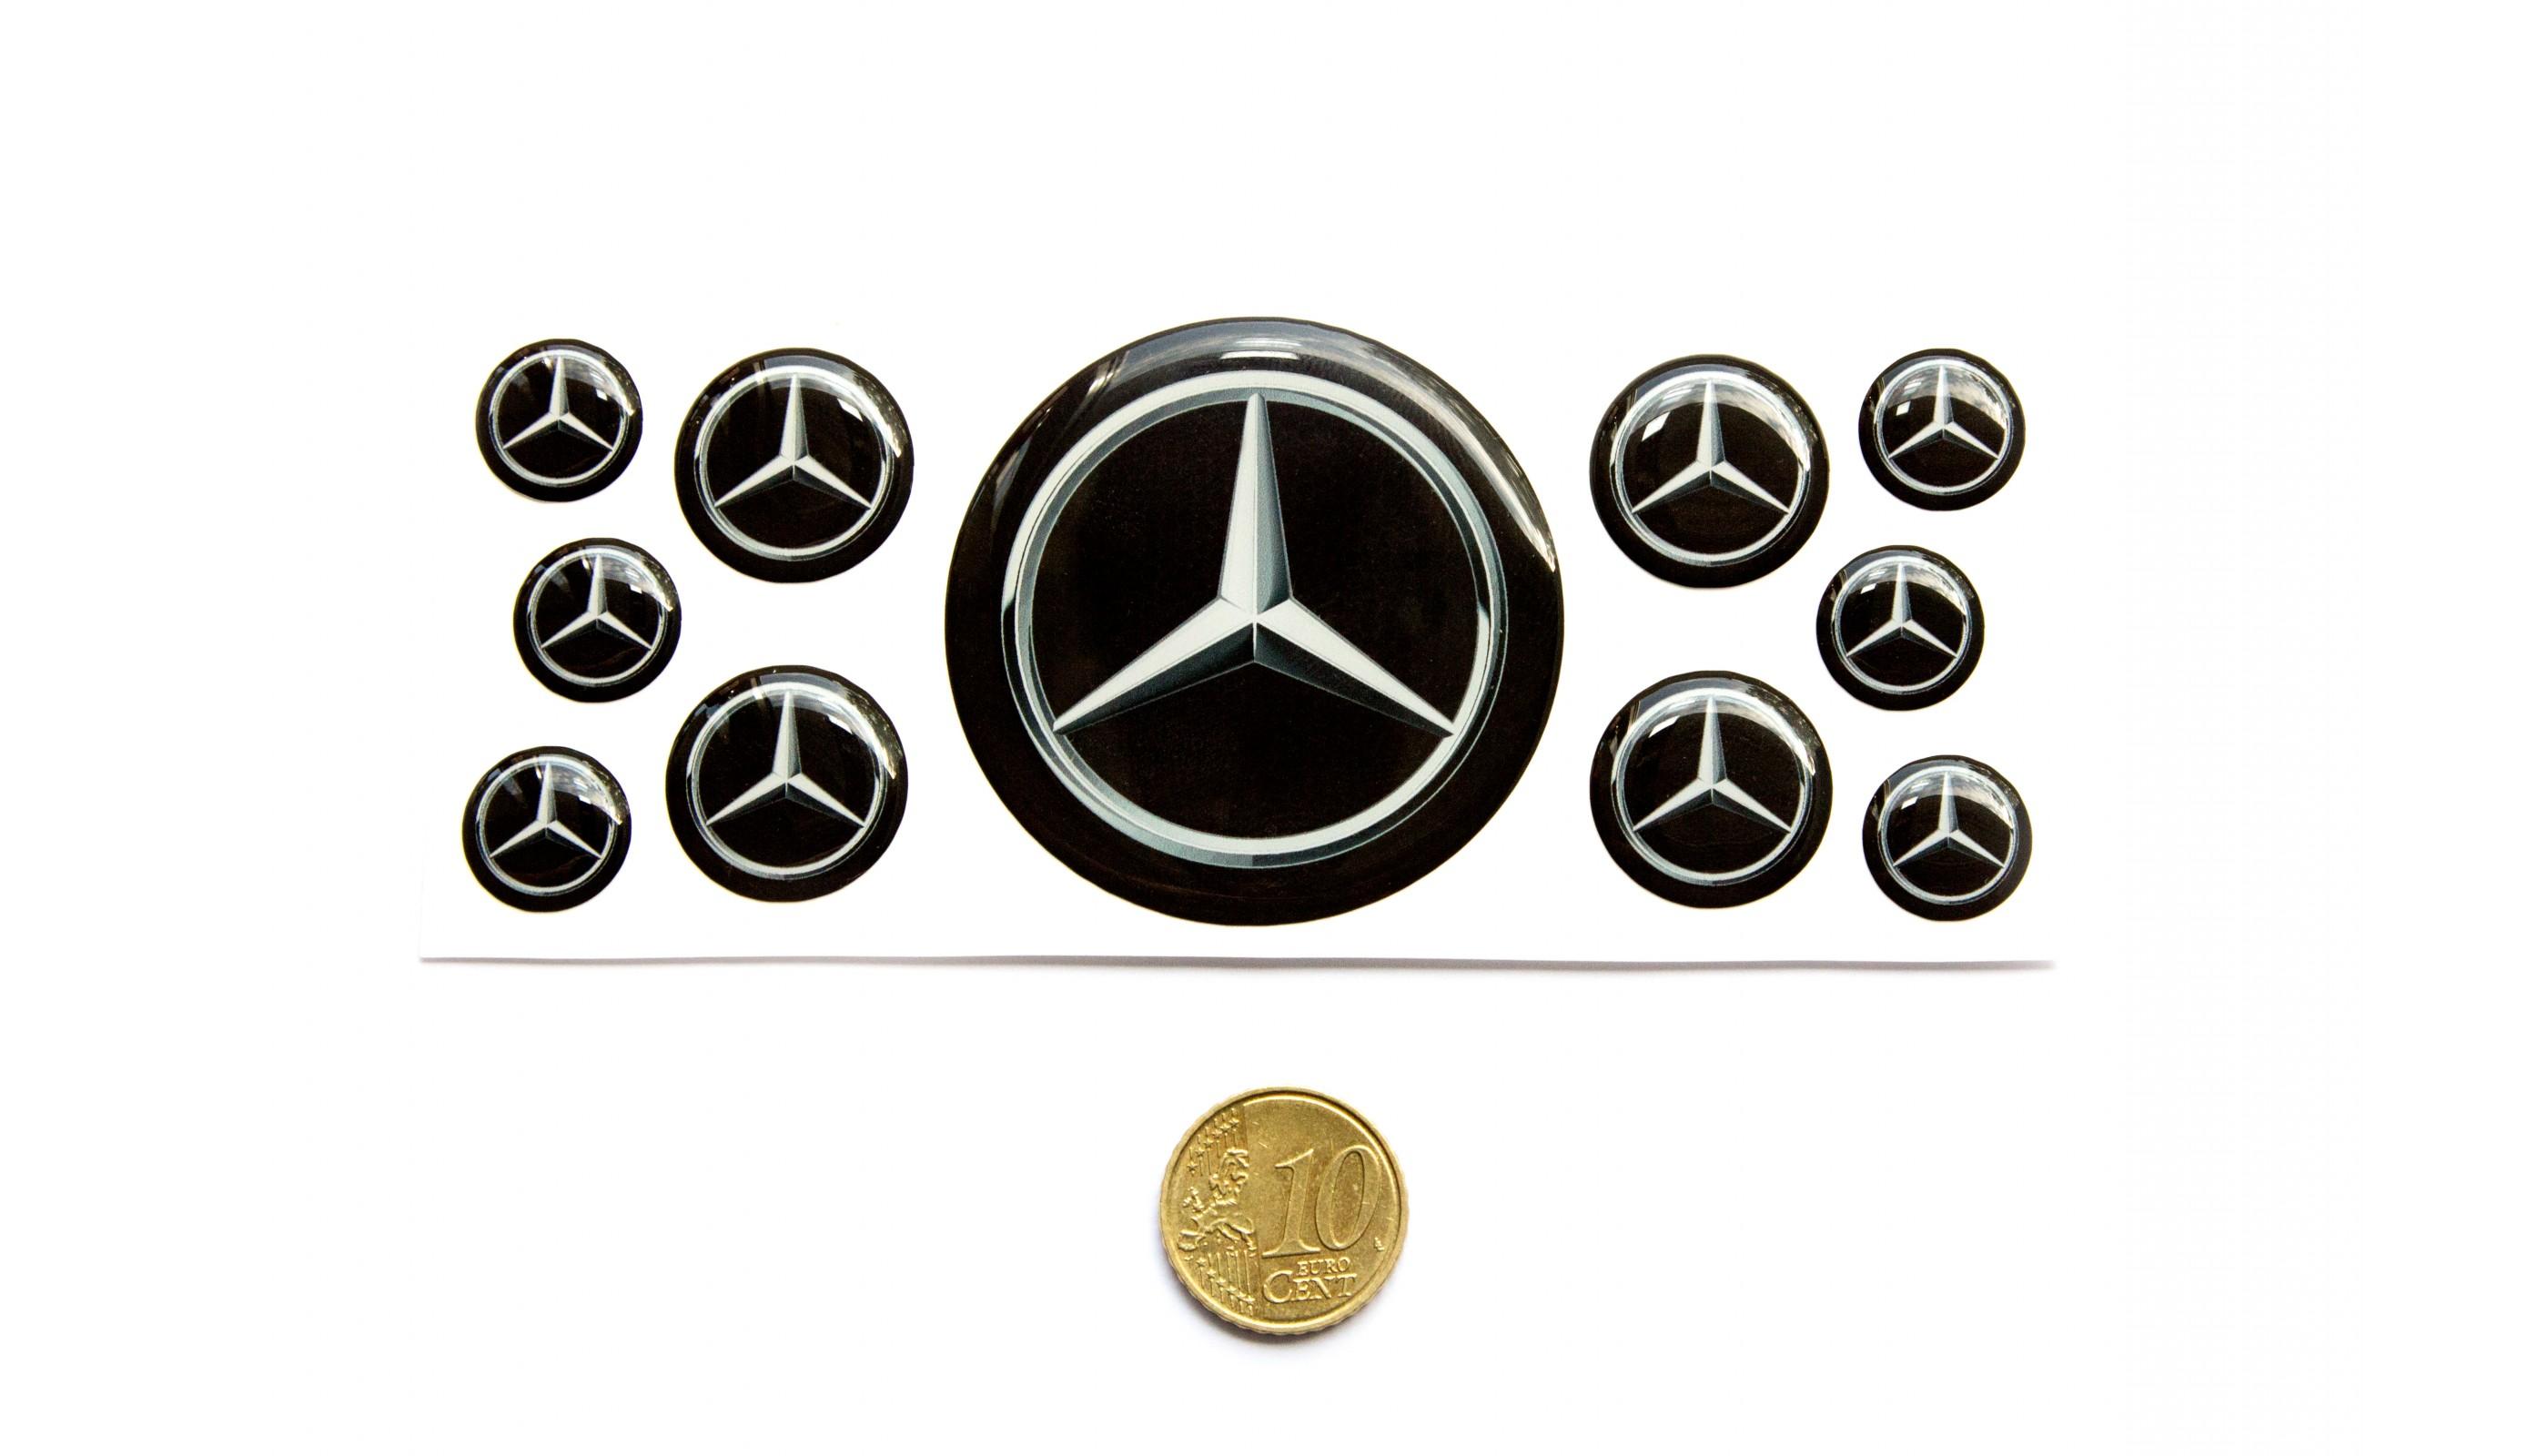 Mercedes Domed Round Emblems